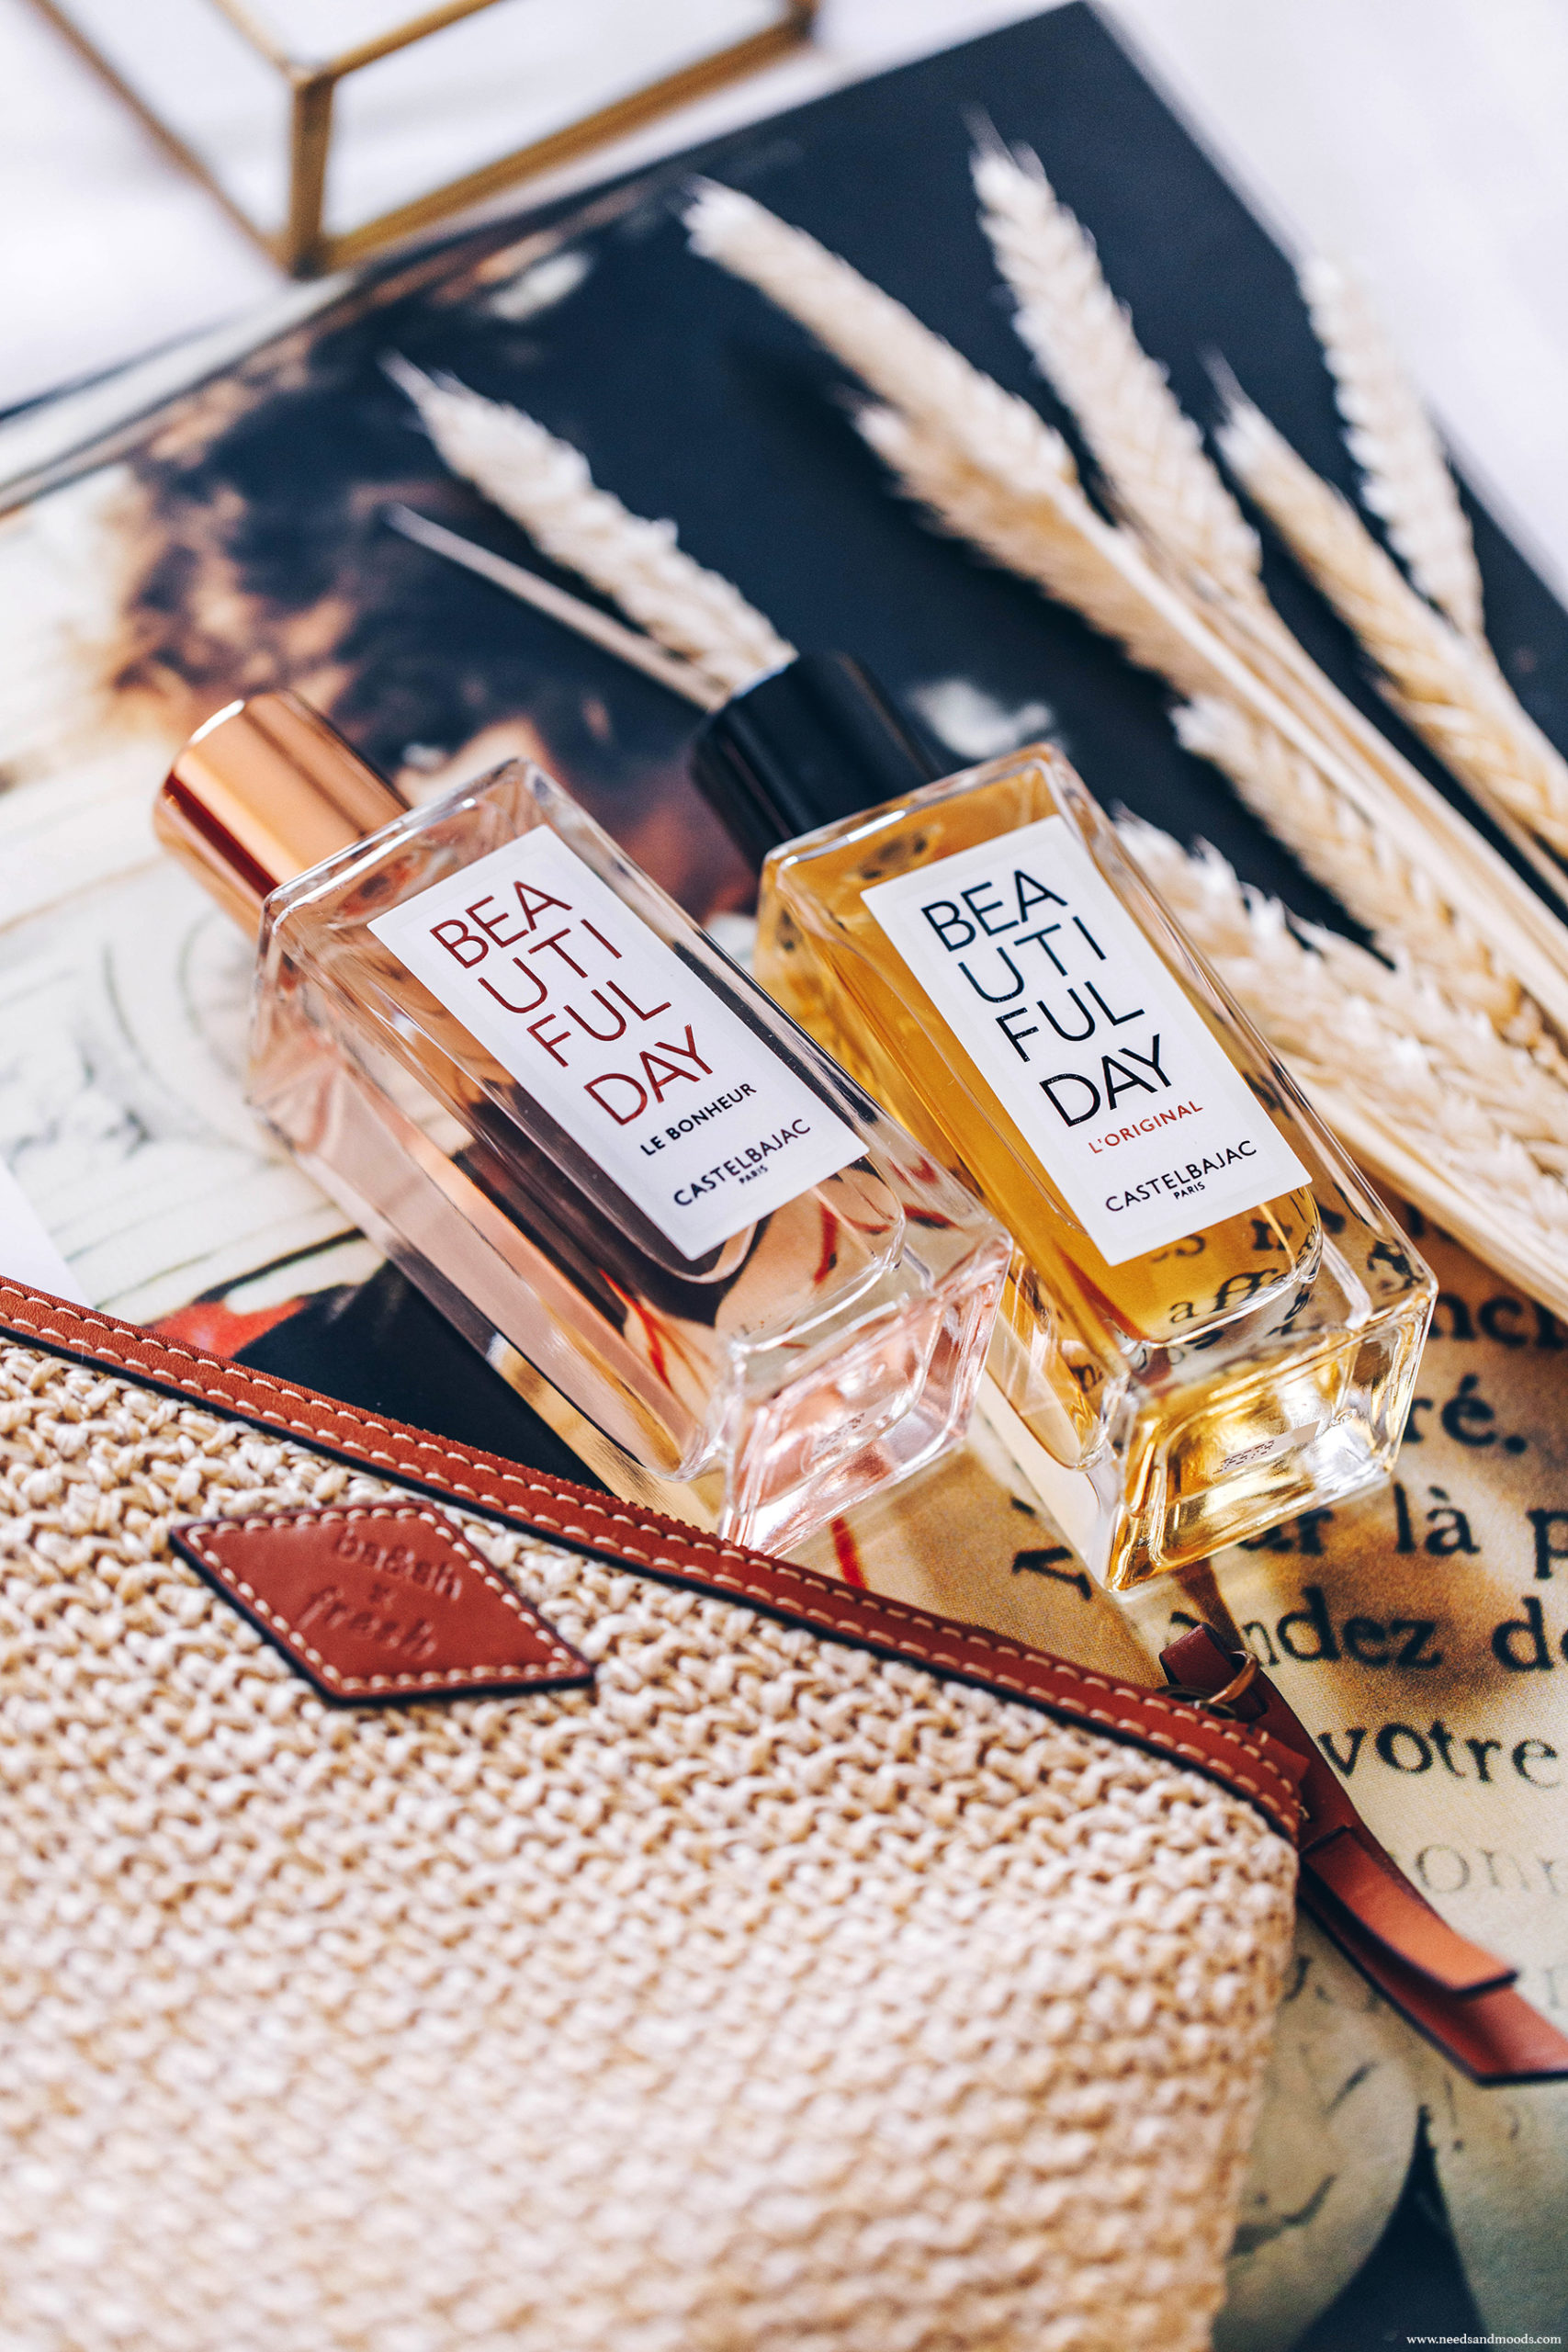 castelbajac parfum beautifull day